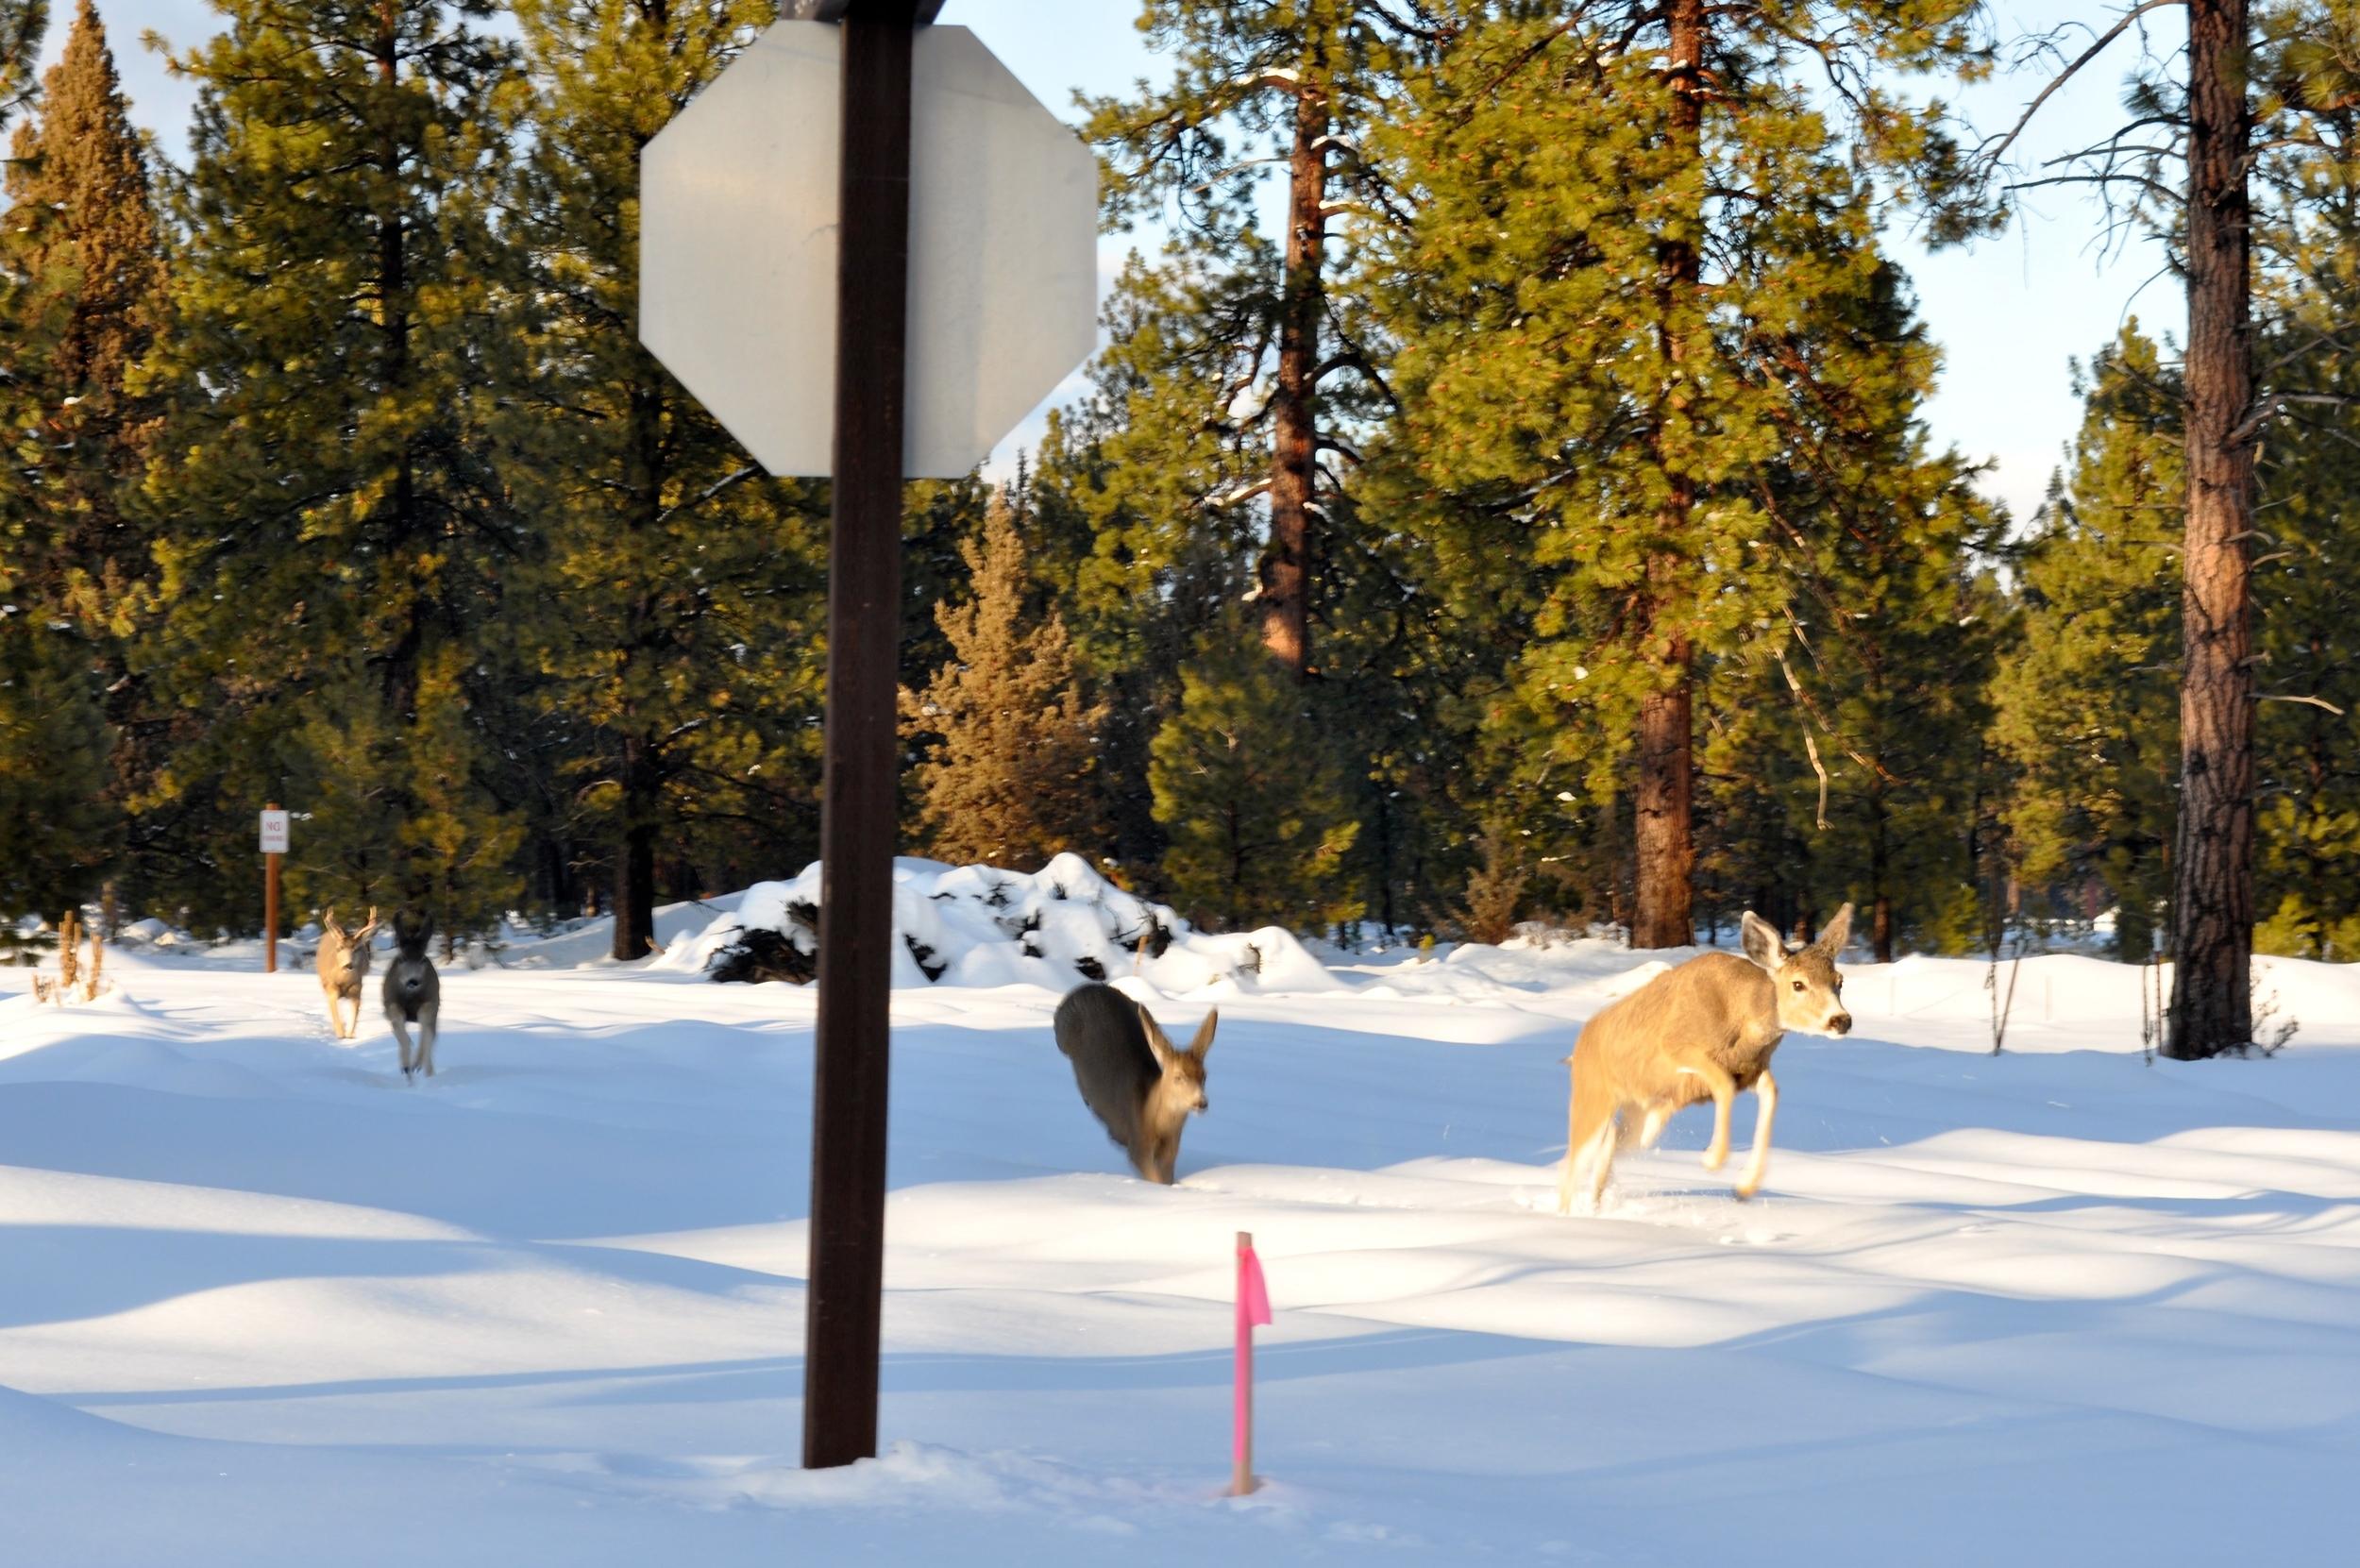 Deer leap through the snow near our house